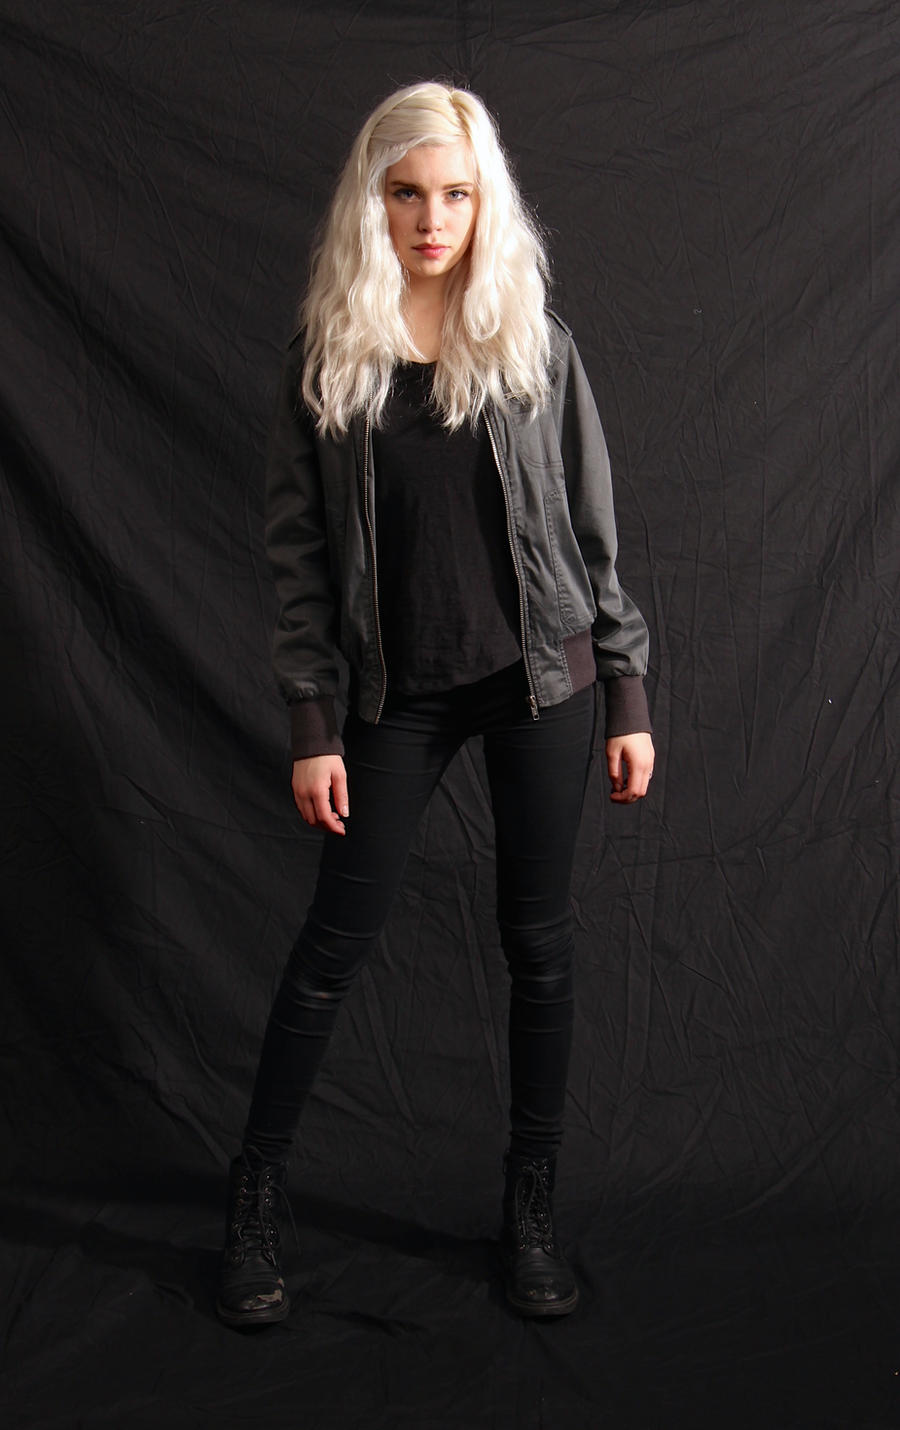 Dauntless - Action Heroine stock 2 by Mirish